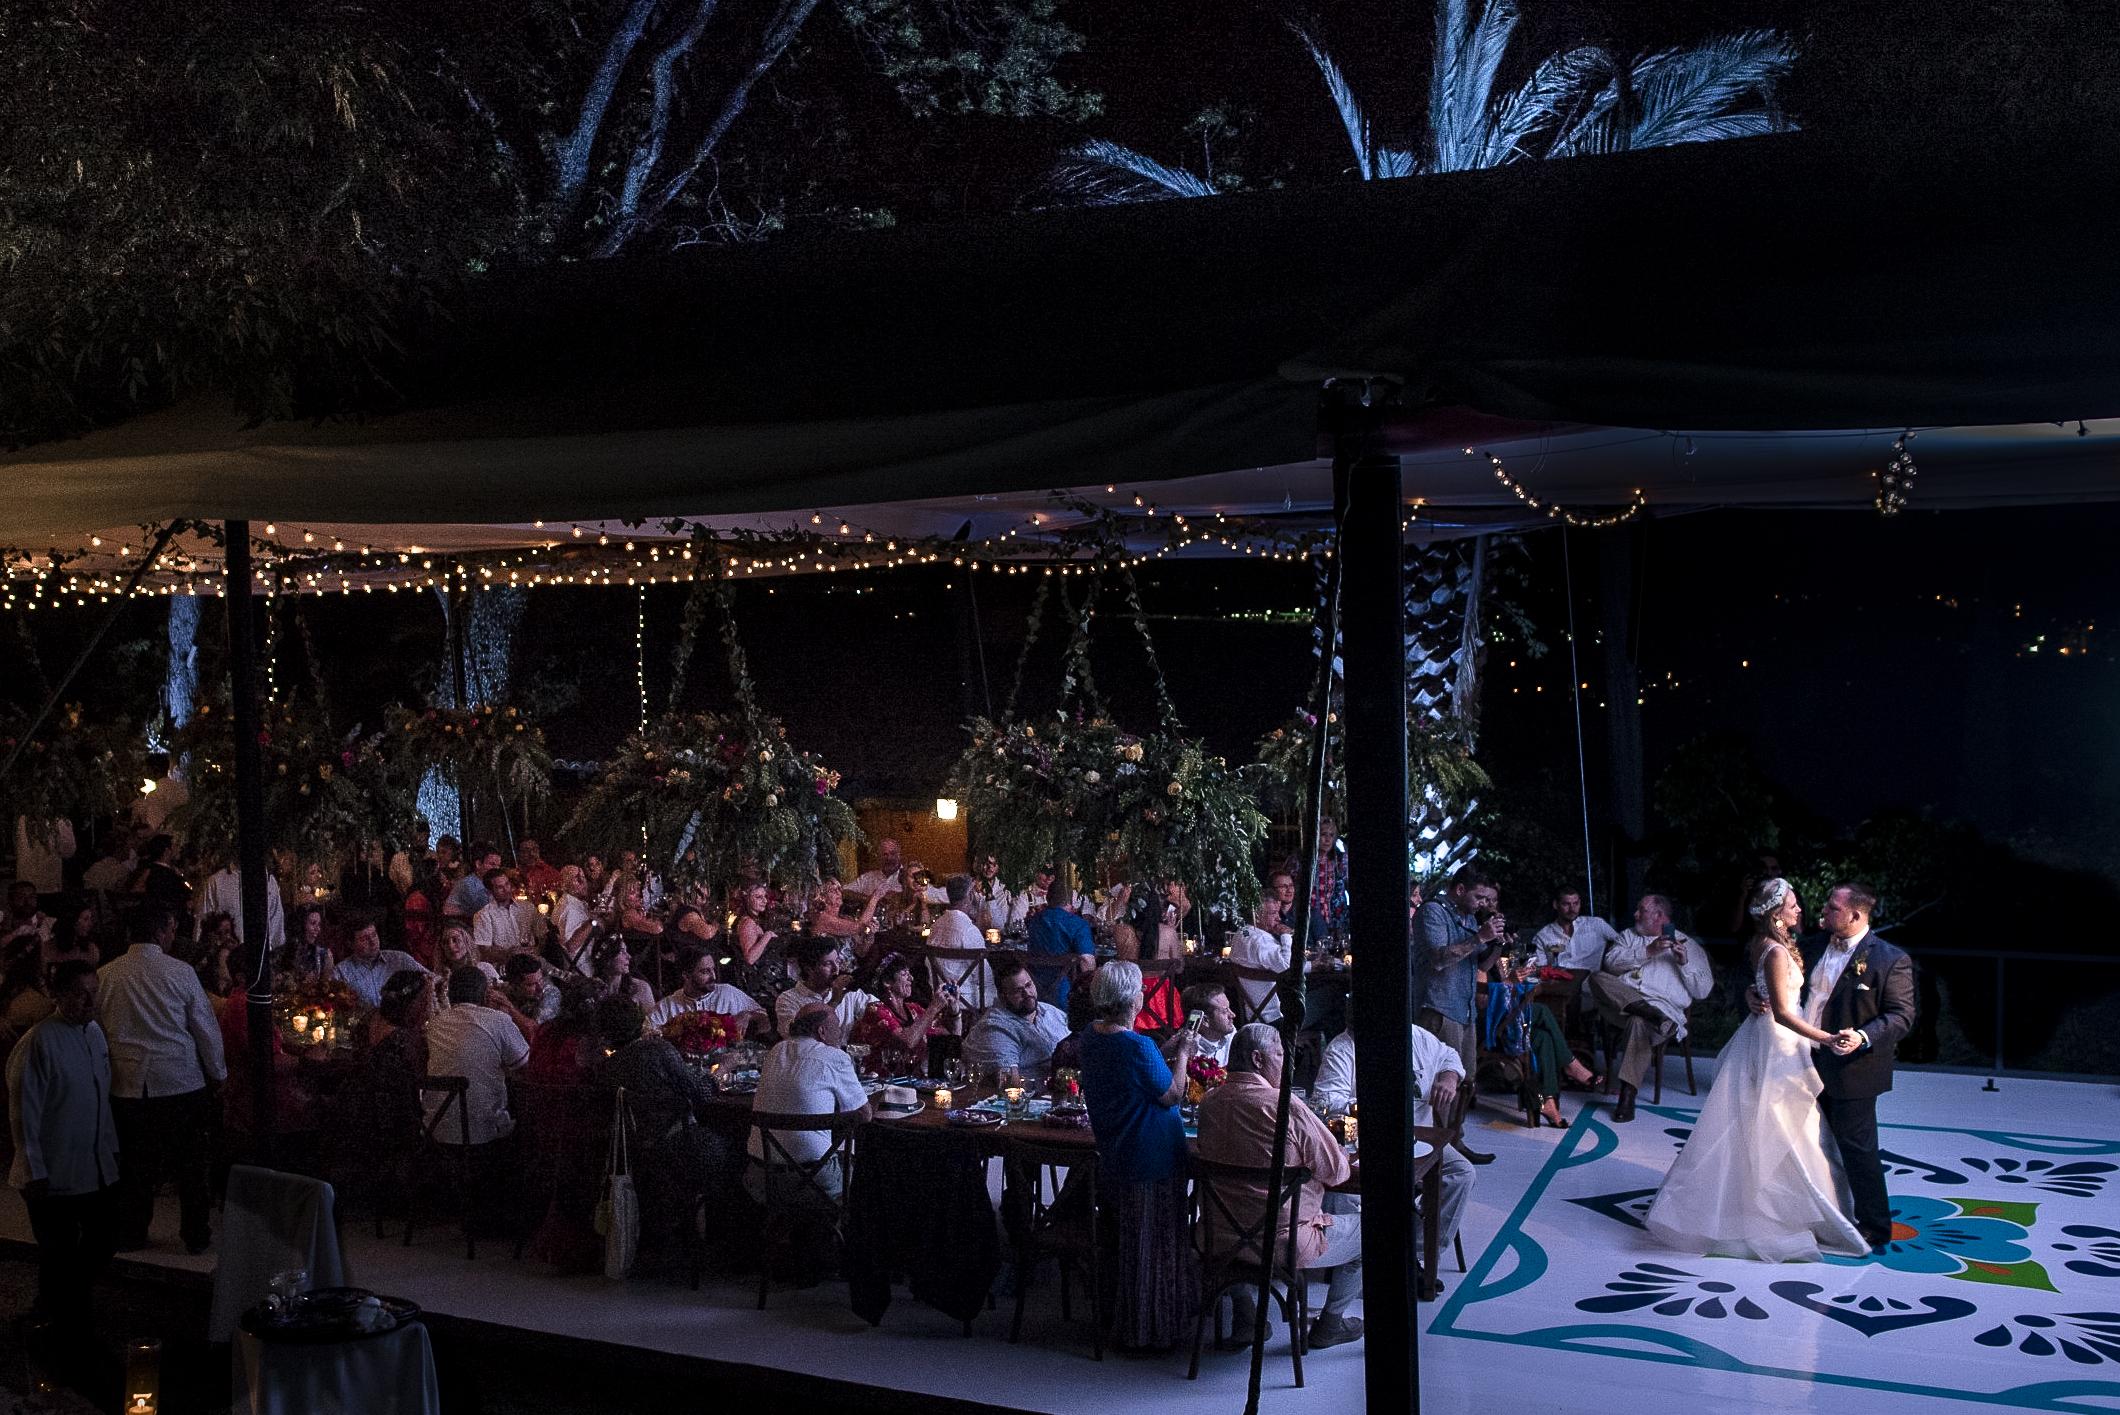 casa_chorro_wedding_san_miguel_de_allende_chio_garcia_photographer (27).jpg